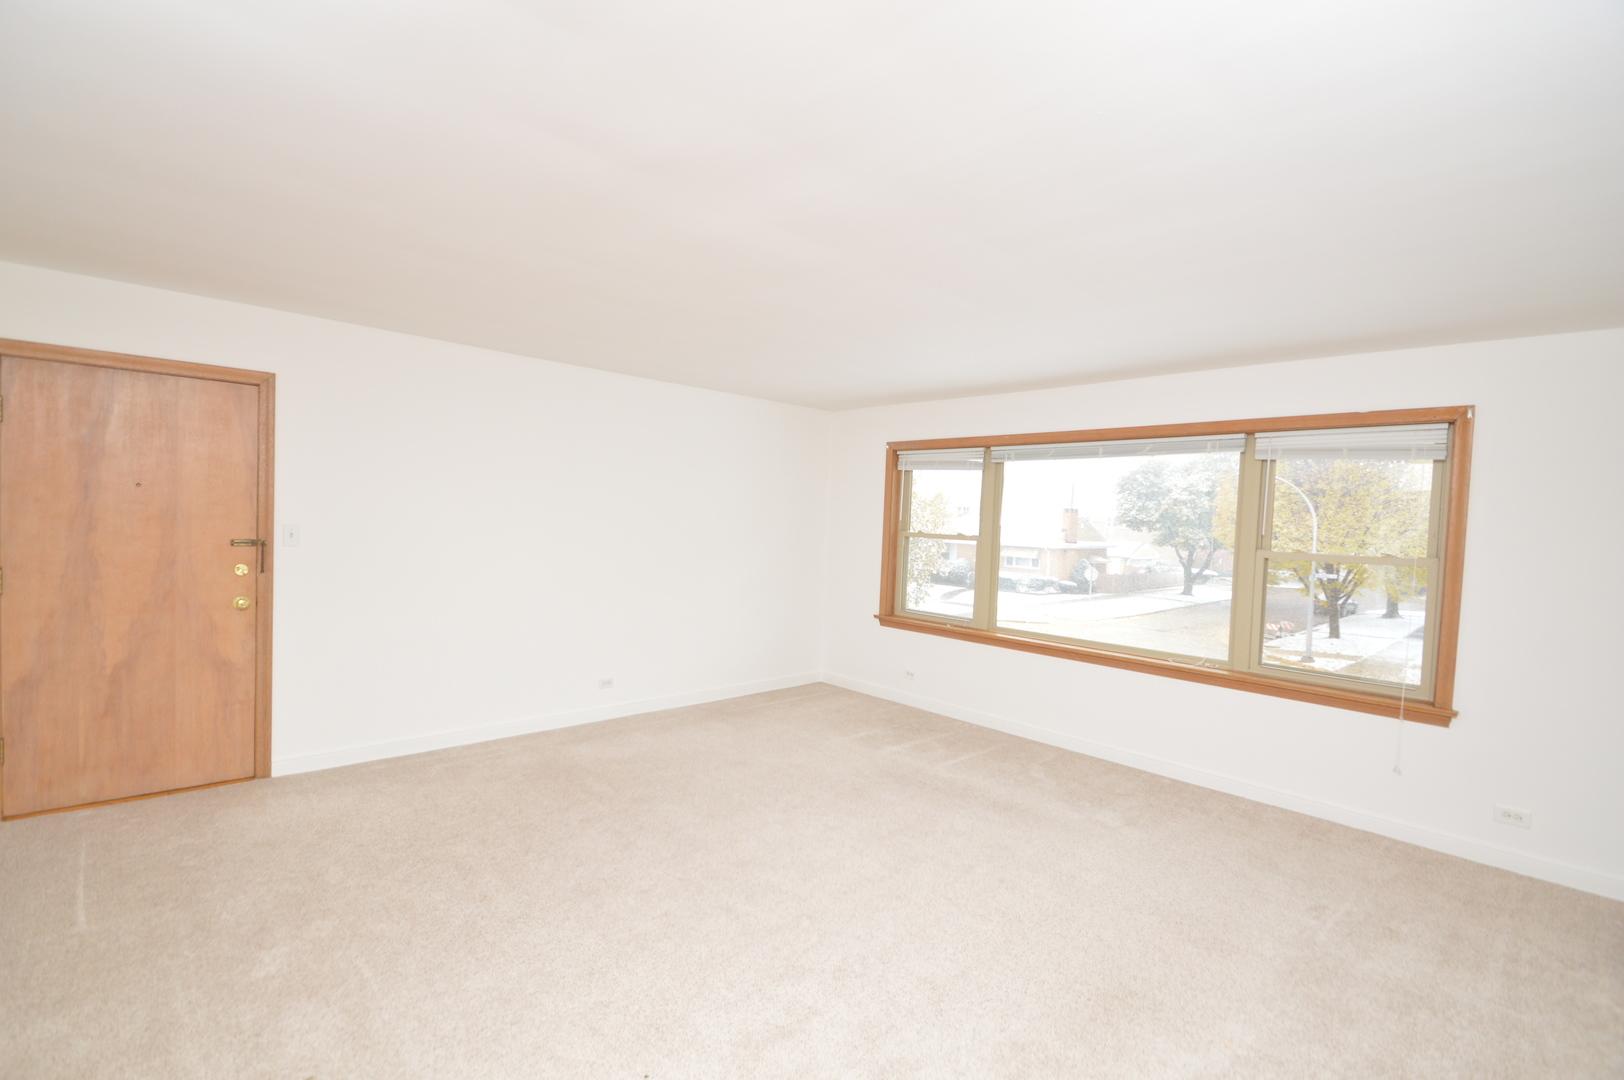 1511 Balmoral, Westchester, Illinois, 60154